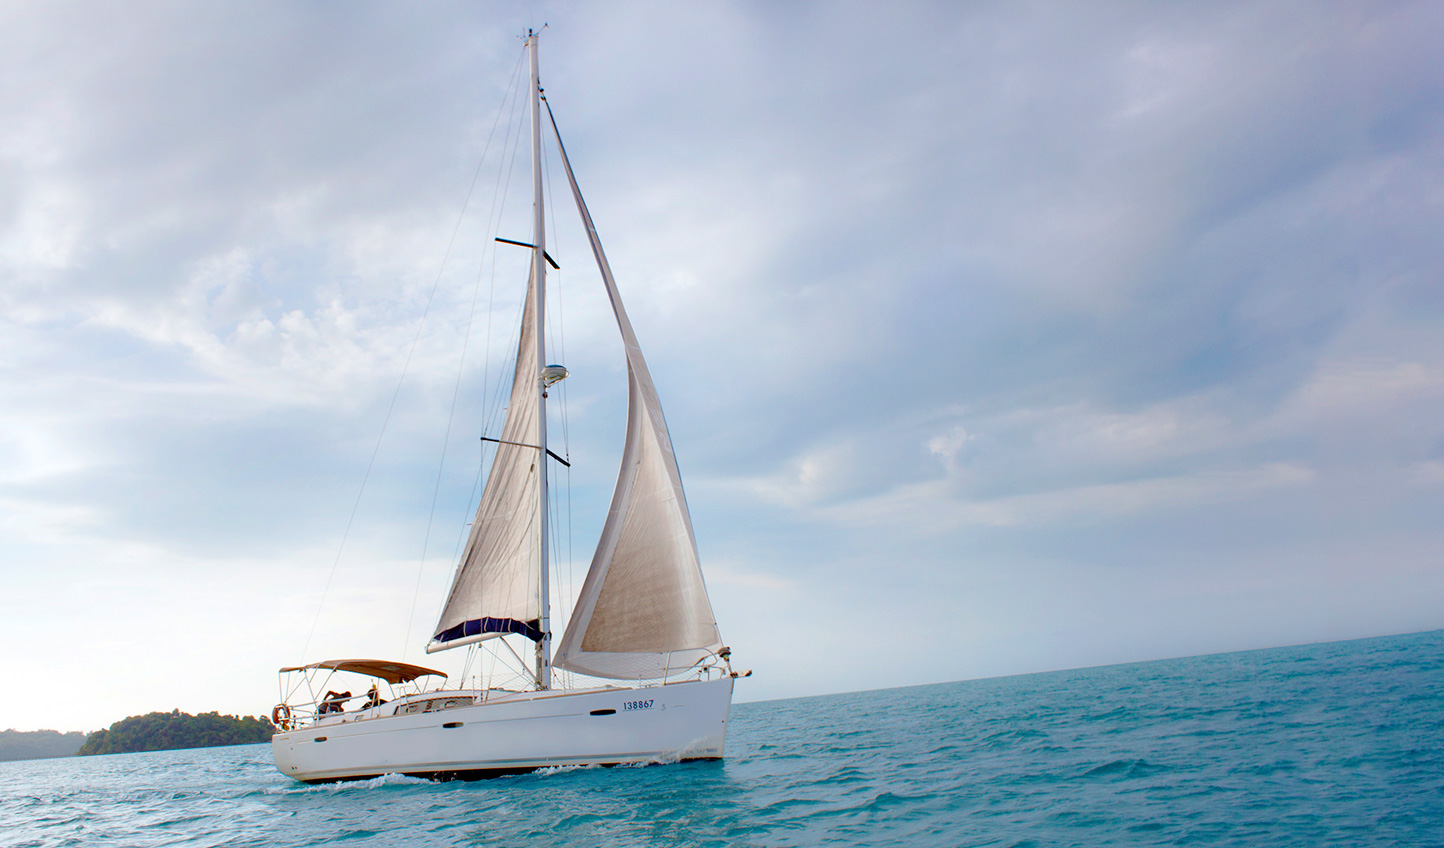 Set sail on board Song Saa's luxurious yacht